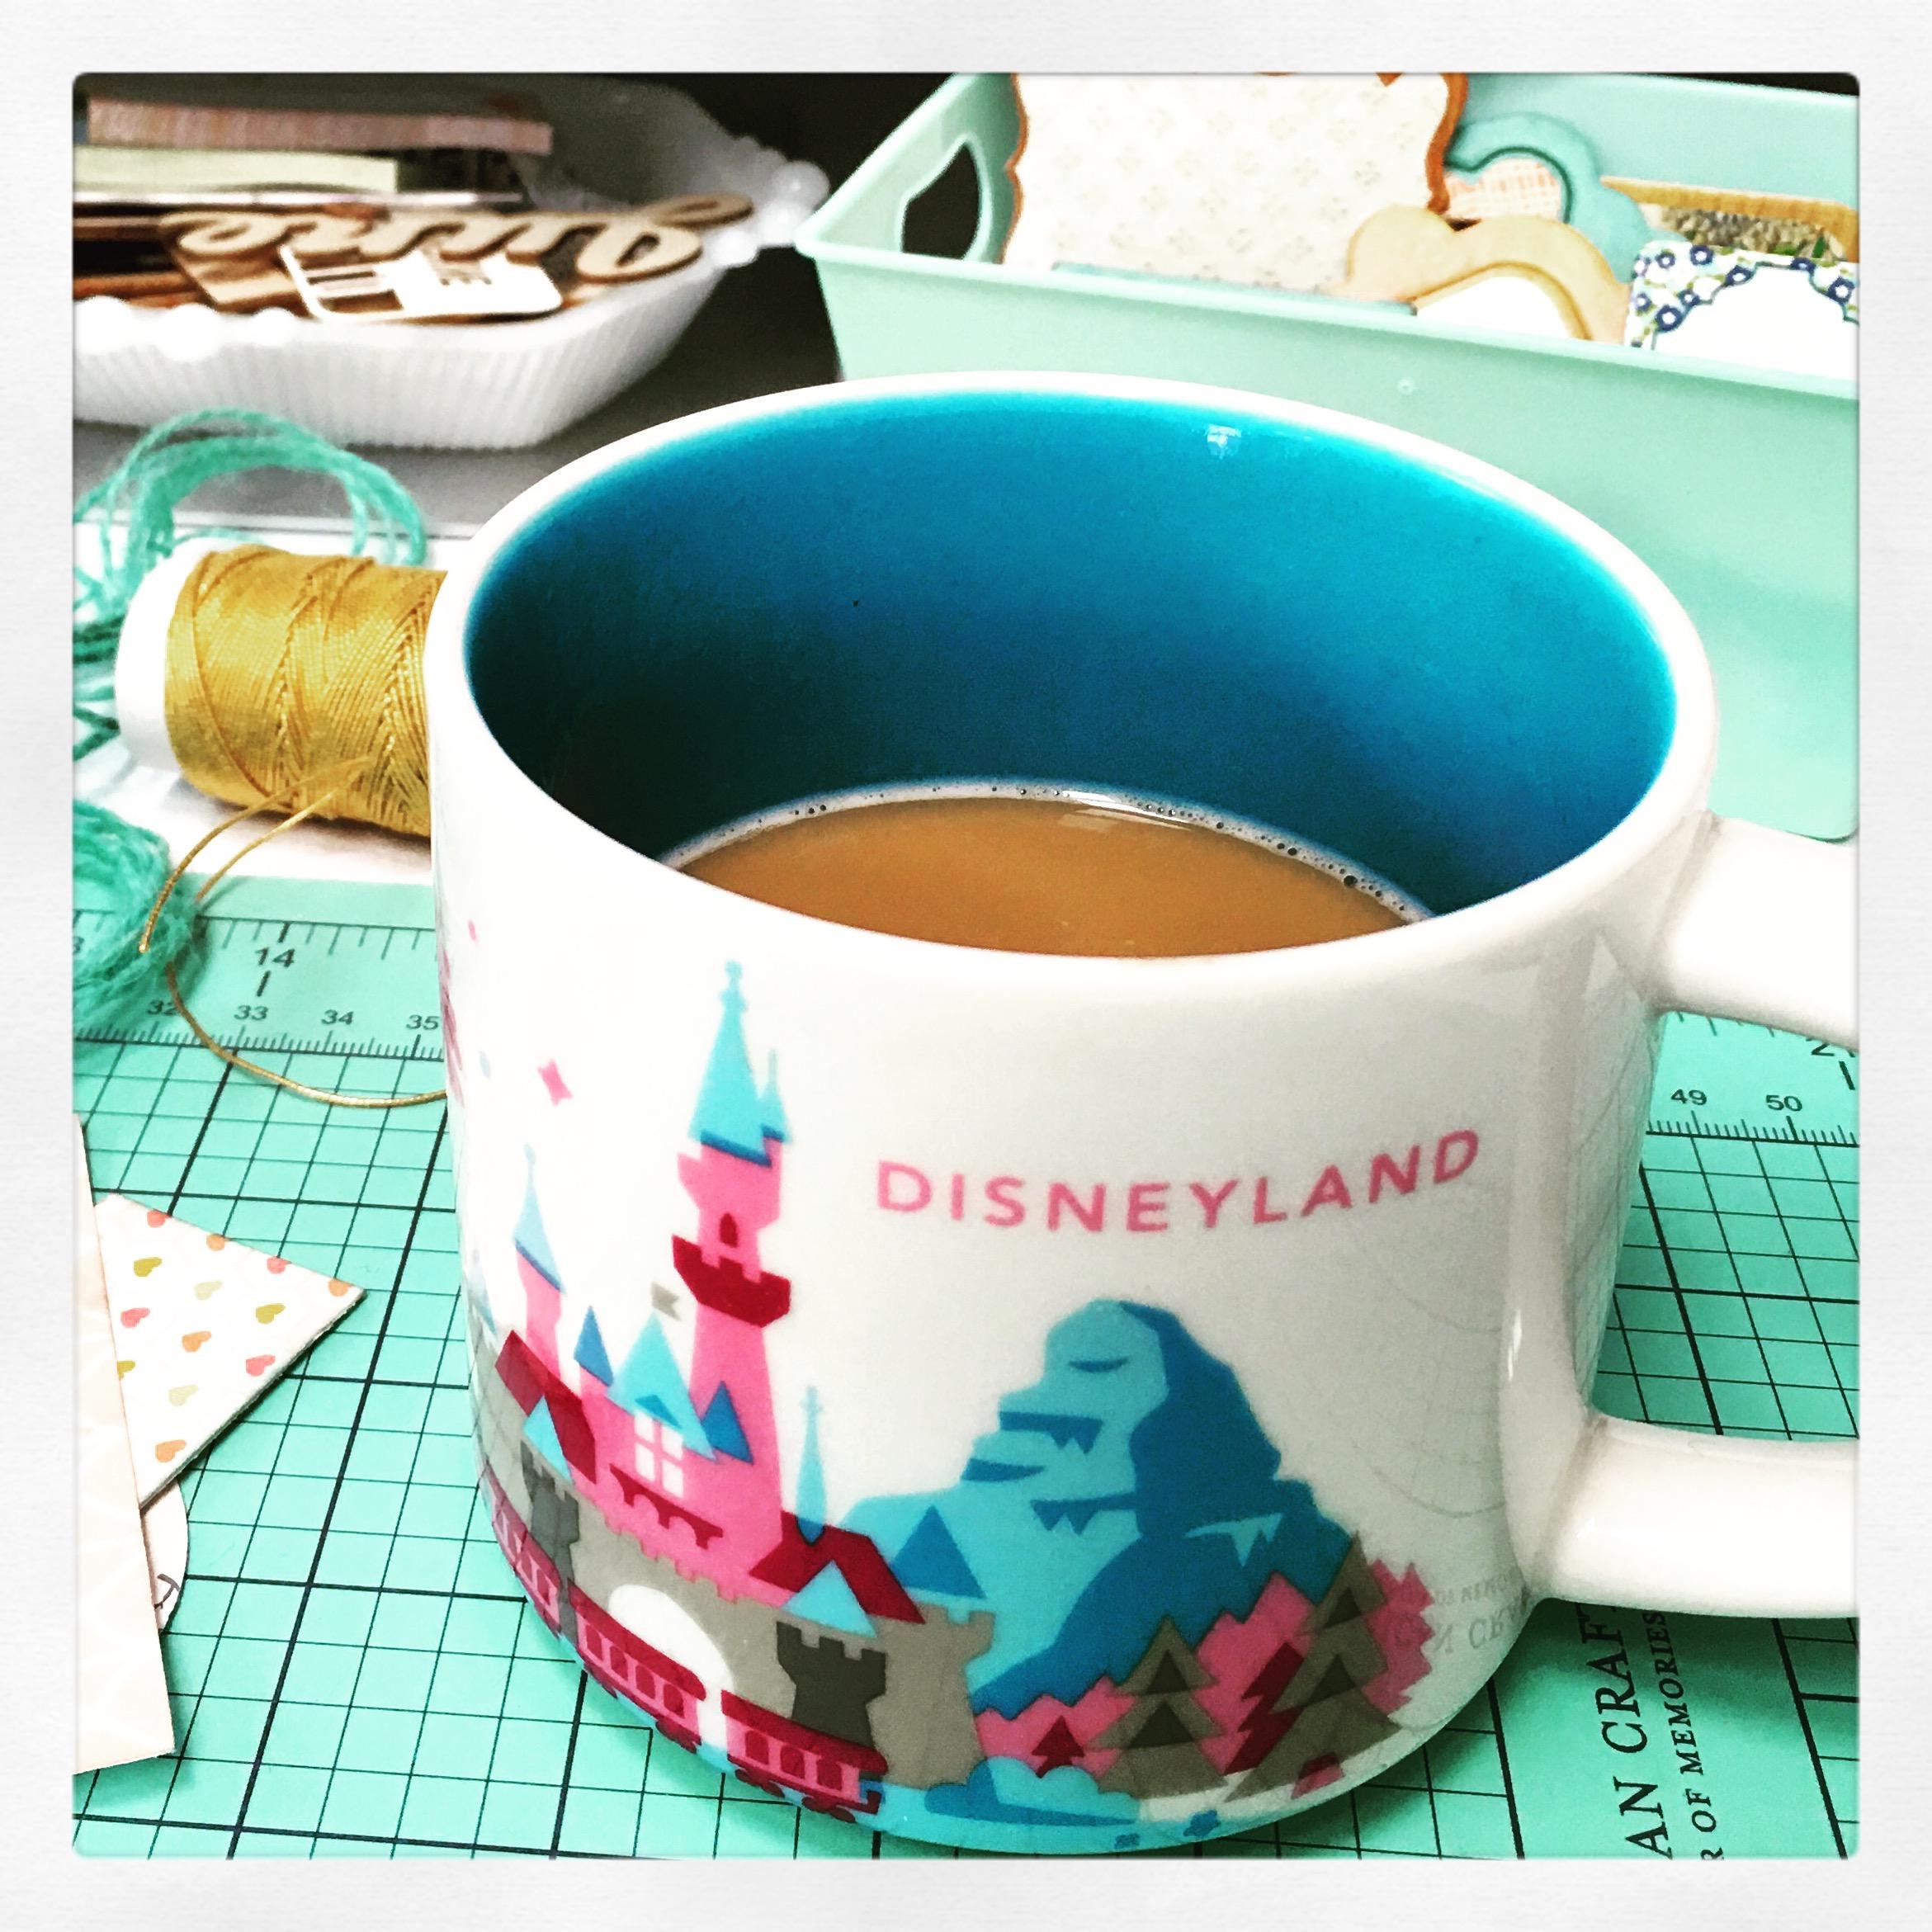 disneyland-coffee-mug-exclusive-scrap-desk-craft-room-a peach-life